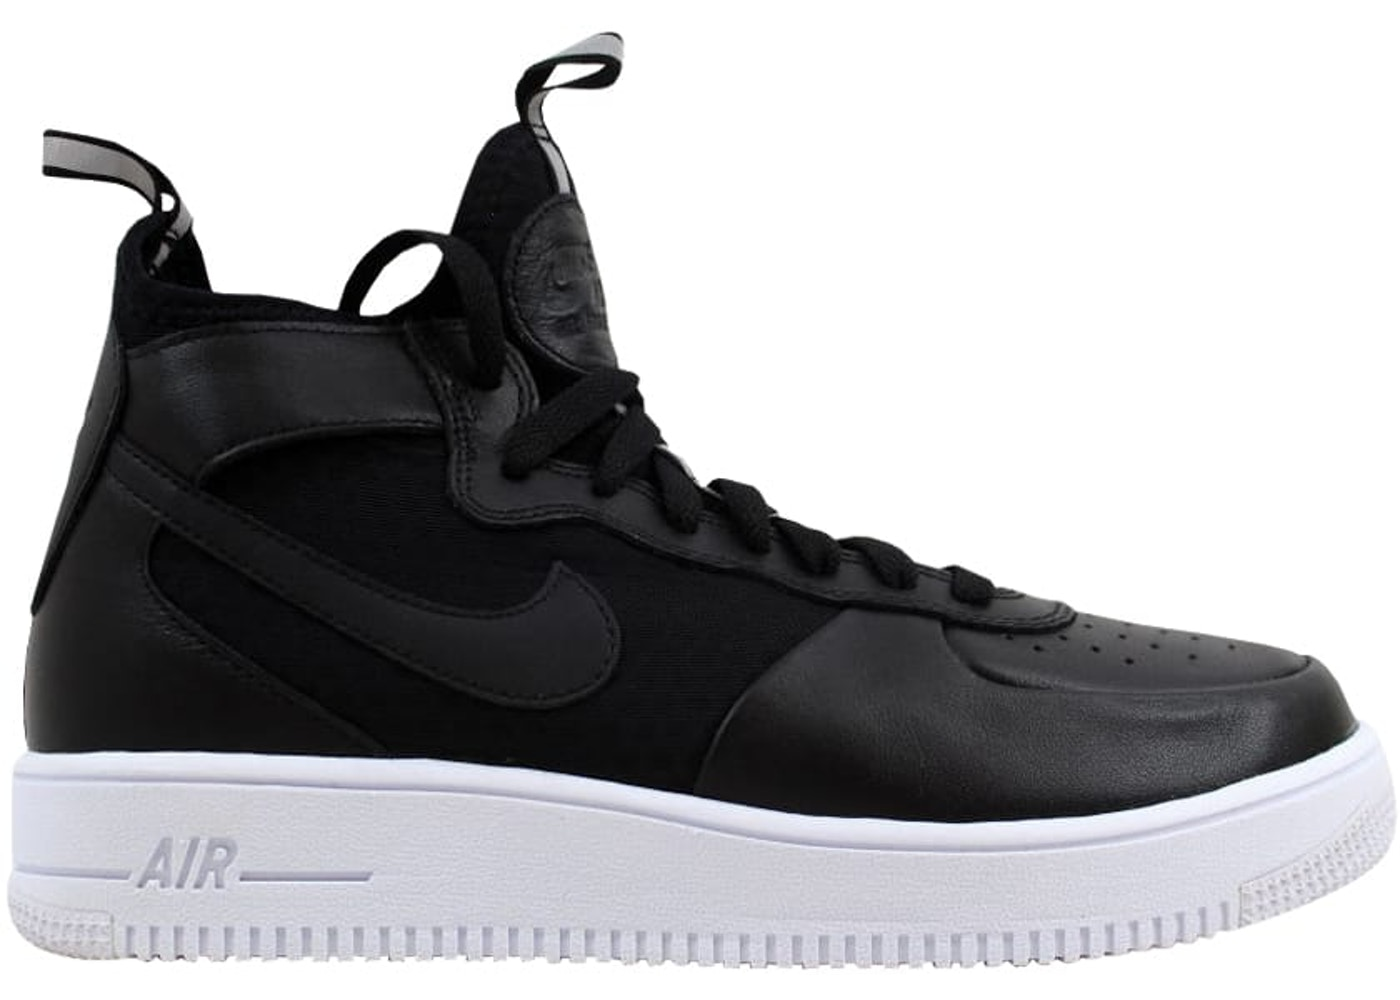 e35092a6b51a Nike Air Force 1 Ultraforce Mid Black Black-White (W) - 864025-001